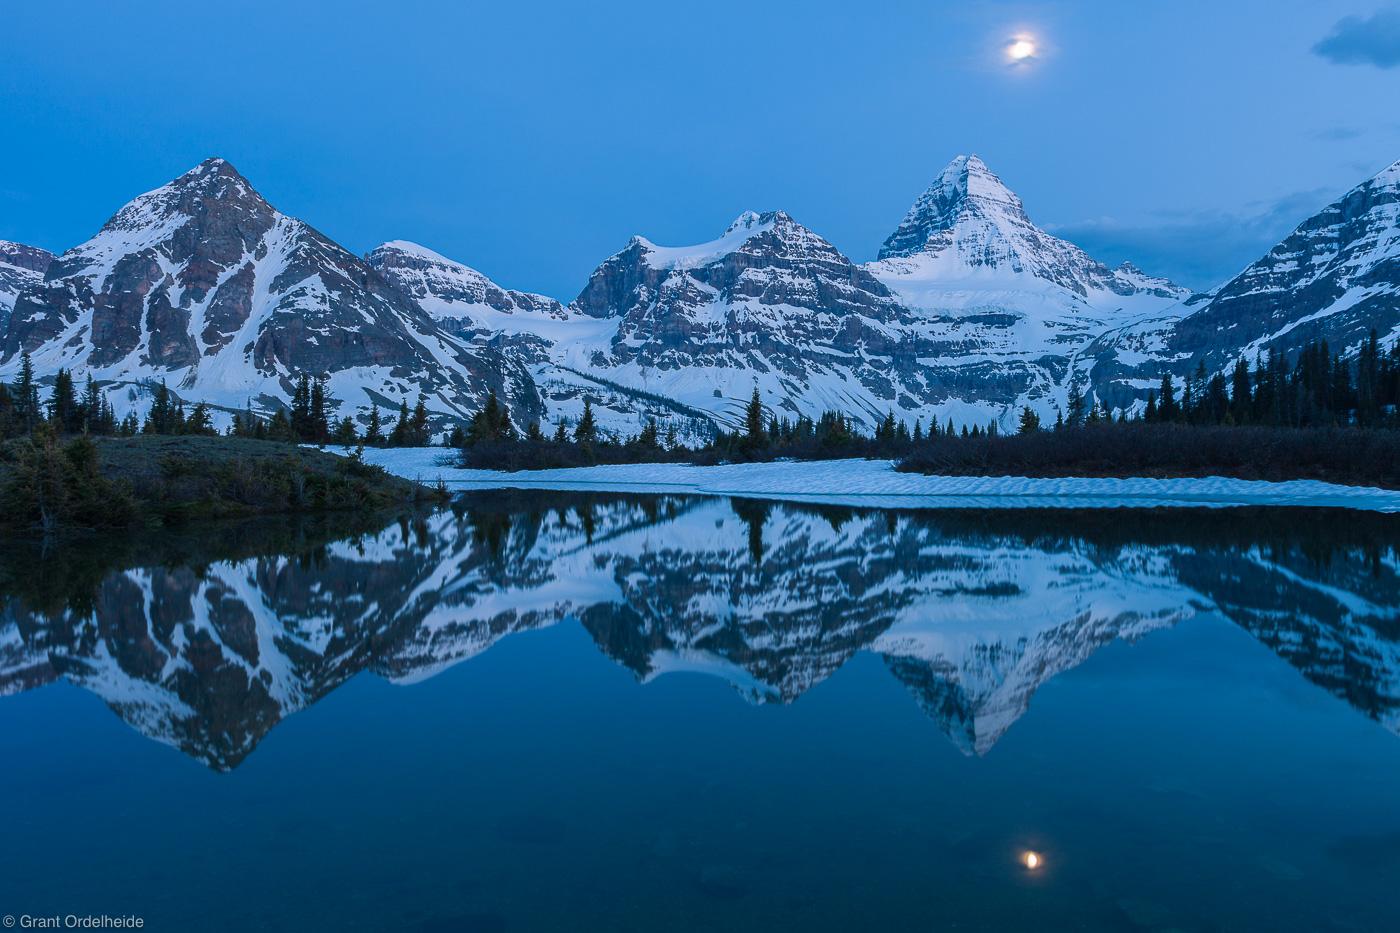 assiniboine, moon, canada, tarn, reflection, british columbia, photo